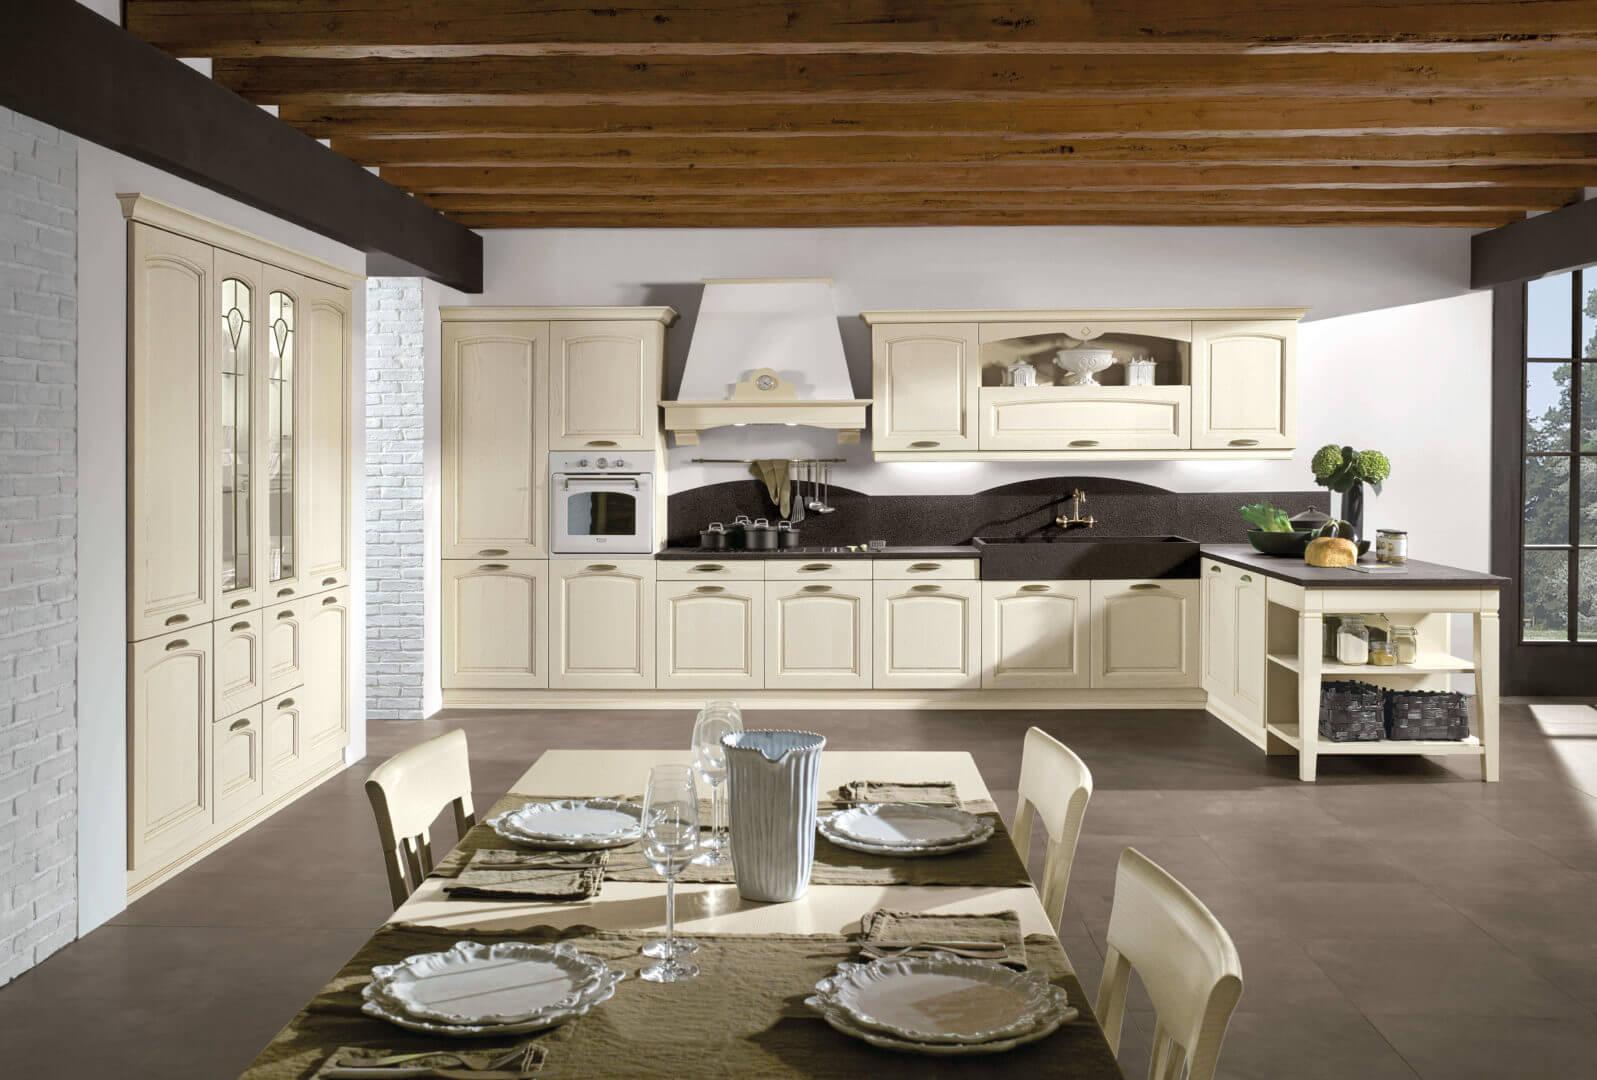 cucina color crema classica padova